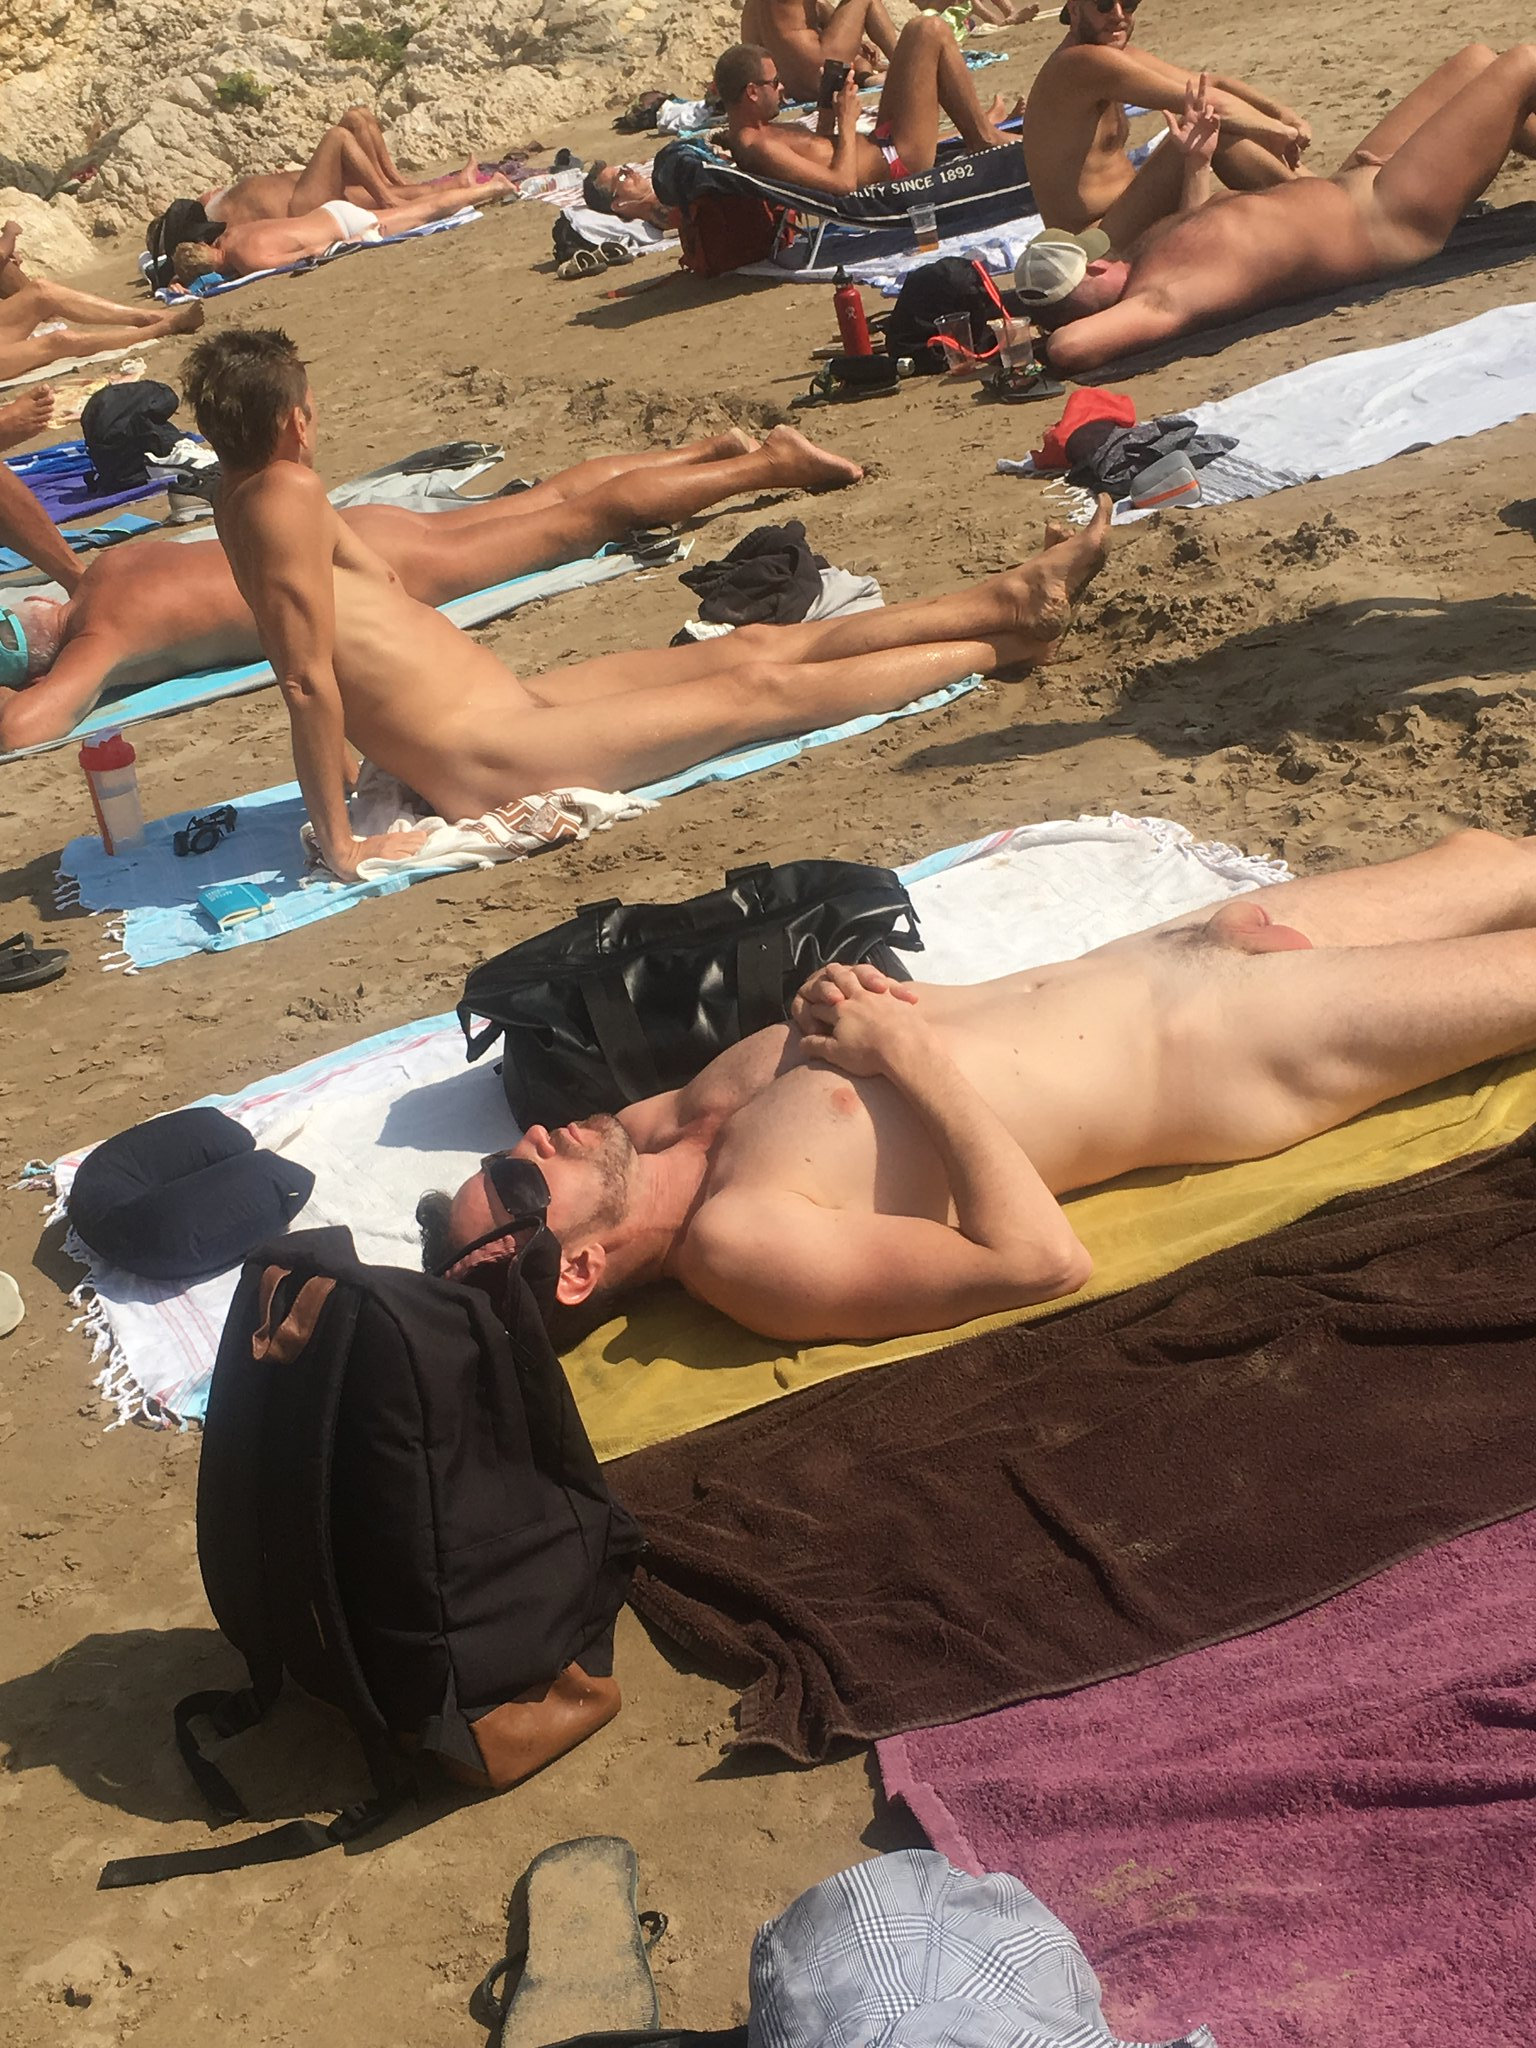 Am fkk strand männer Wichsende Maenner